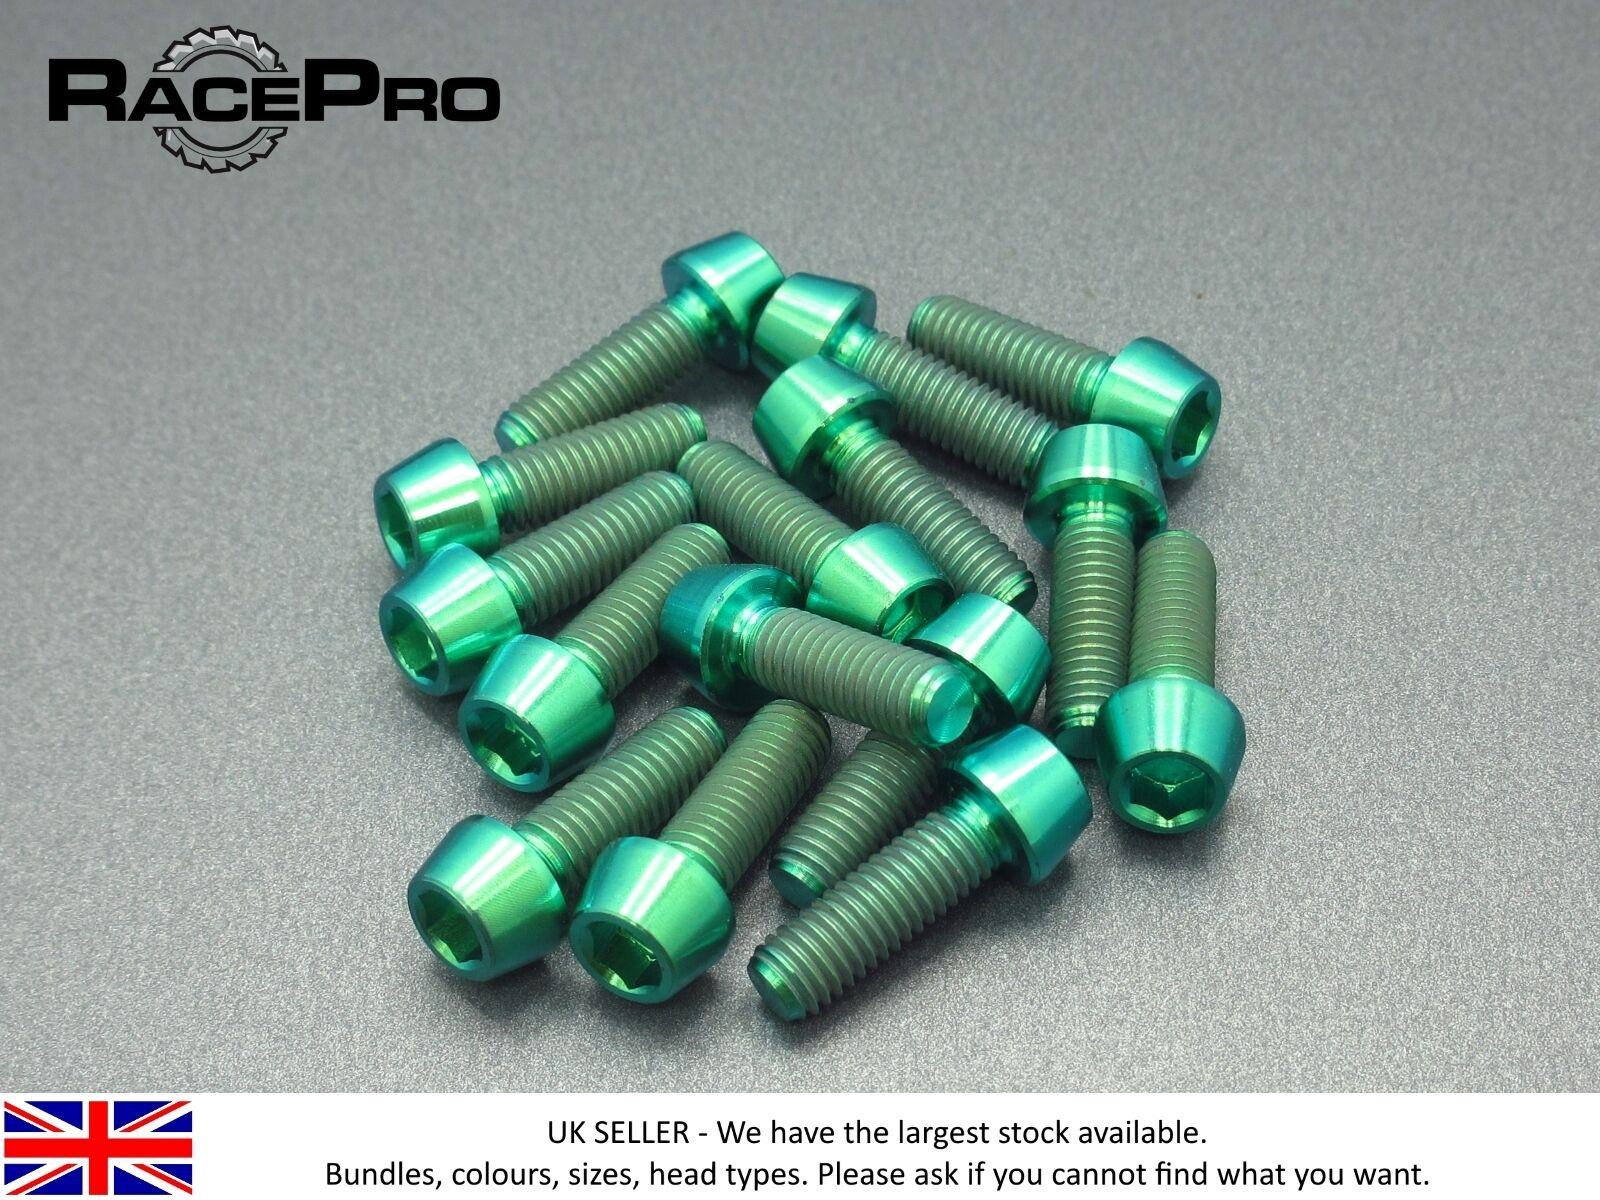 Racepro - 20 X Tornillo Cónico de Titanio Gr5-M6 X 30mm X 1mm -